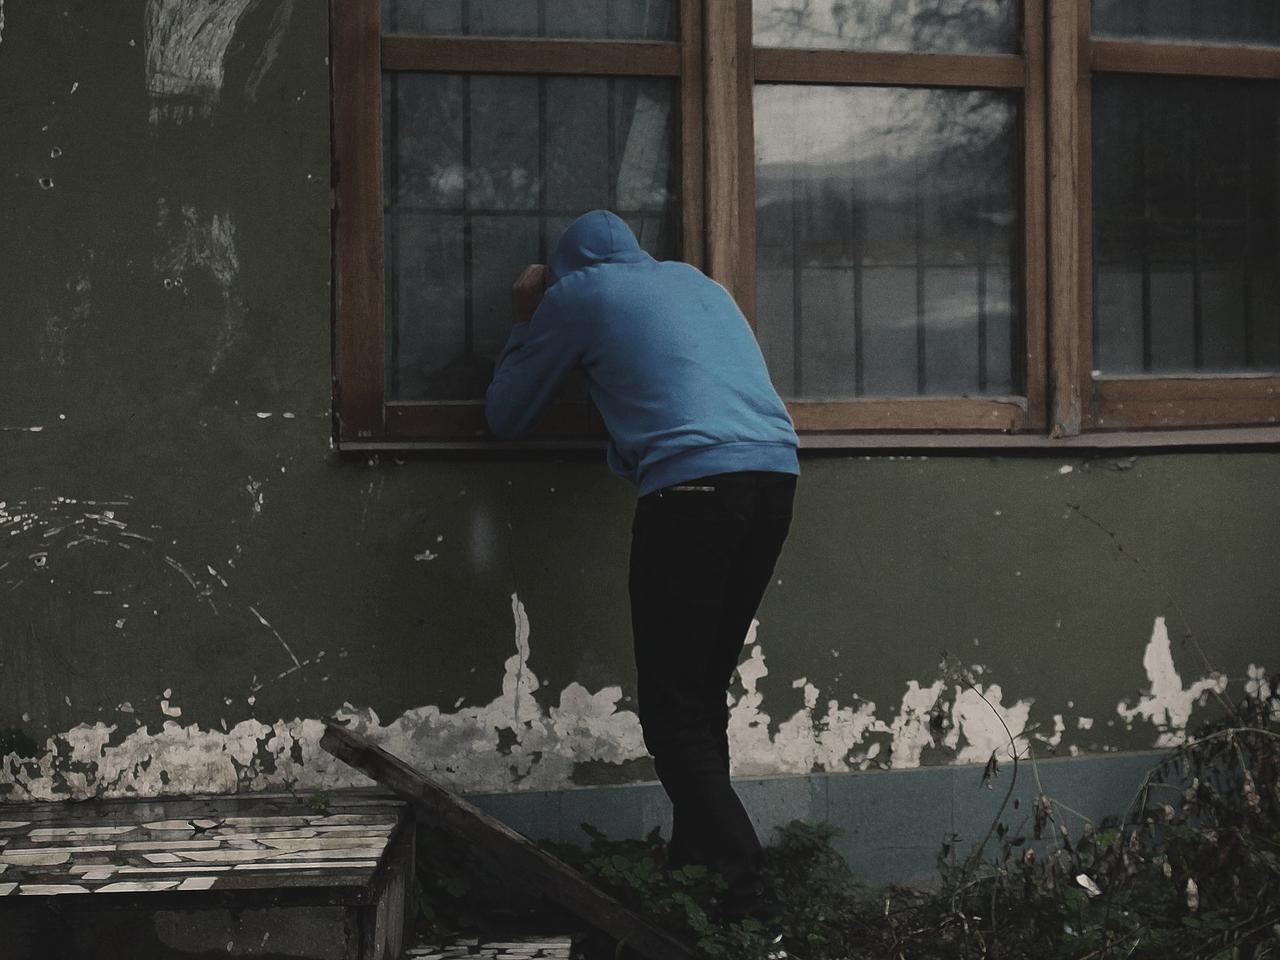 Штраф за подглядывания в чужие окна